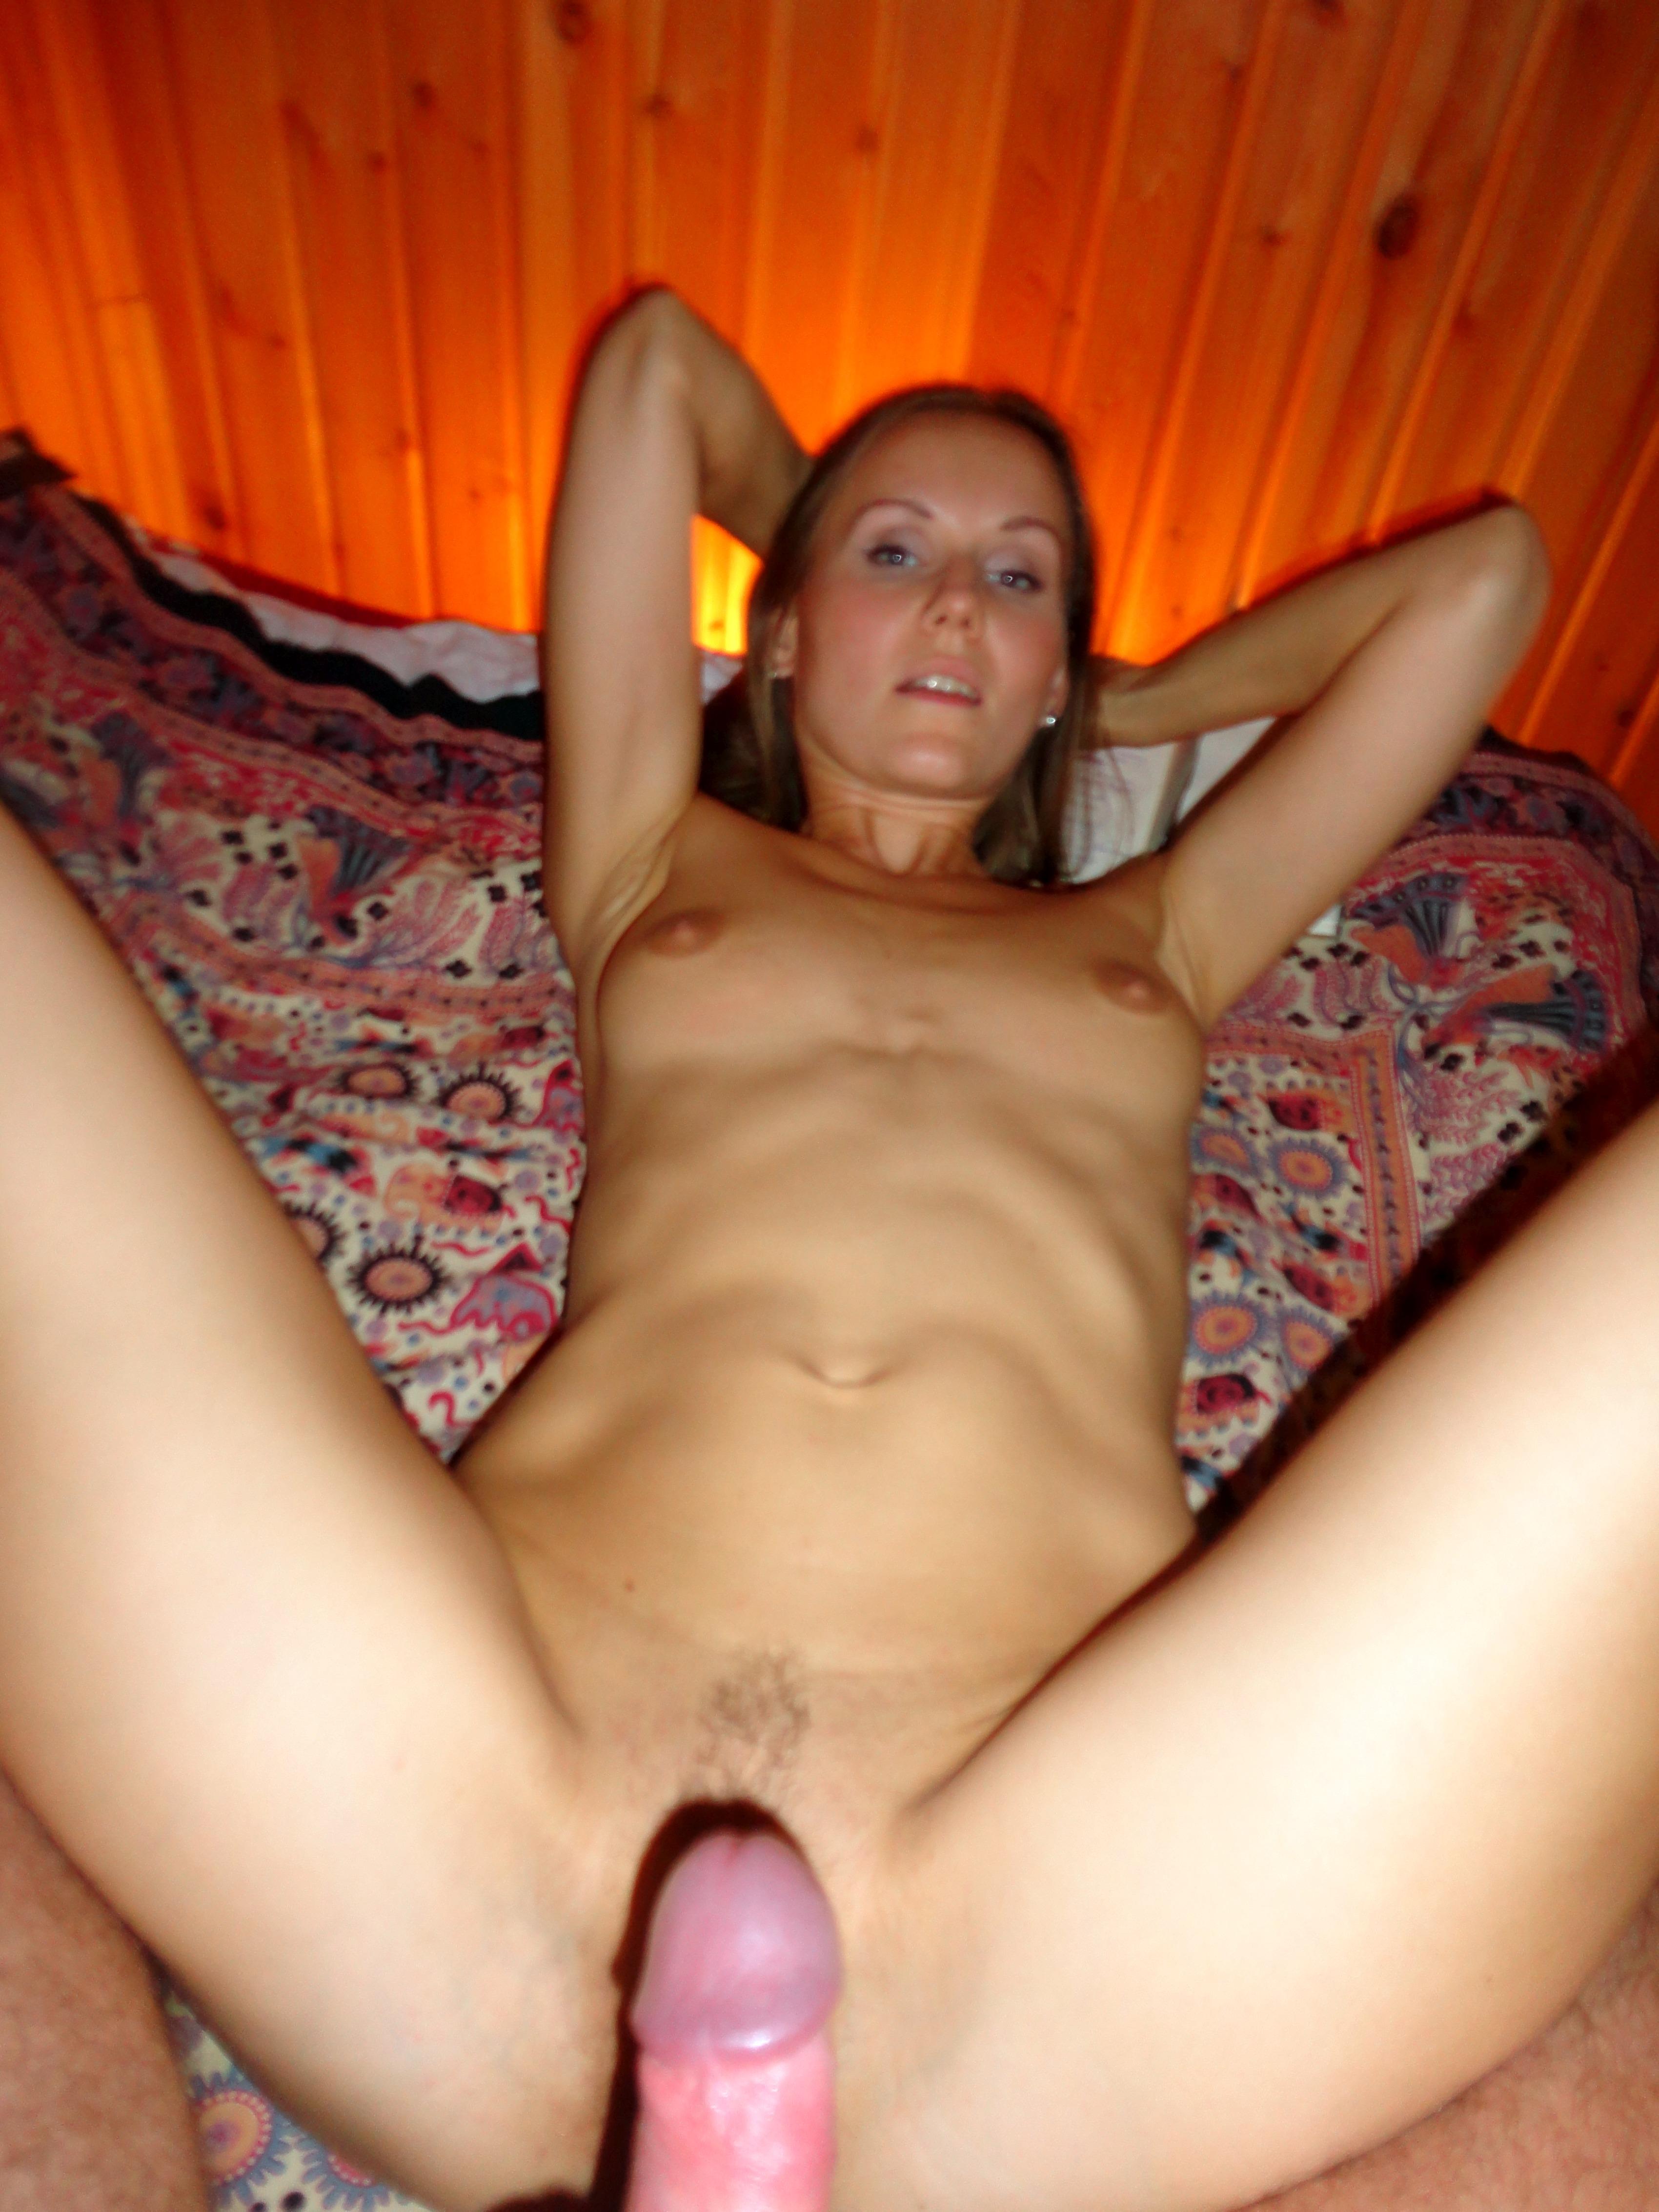 privaten Pornoaufnahmen